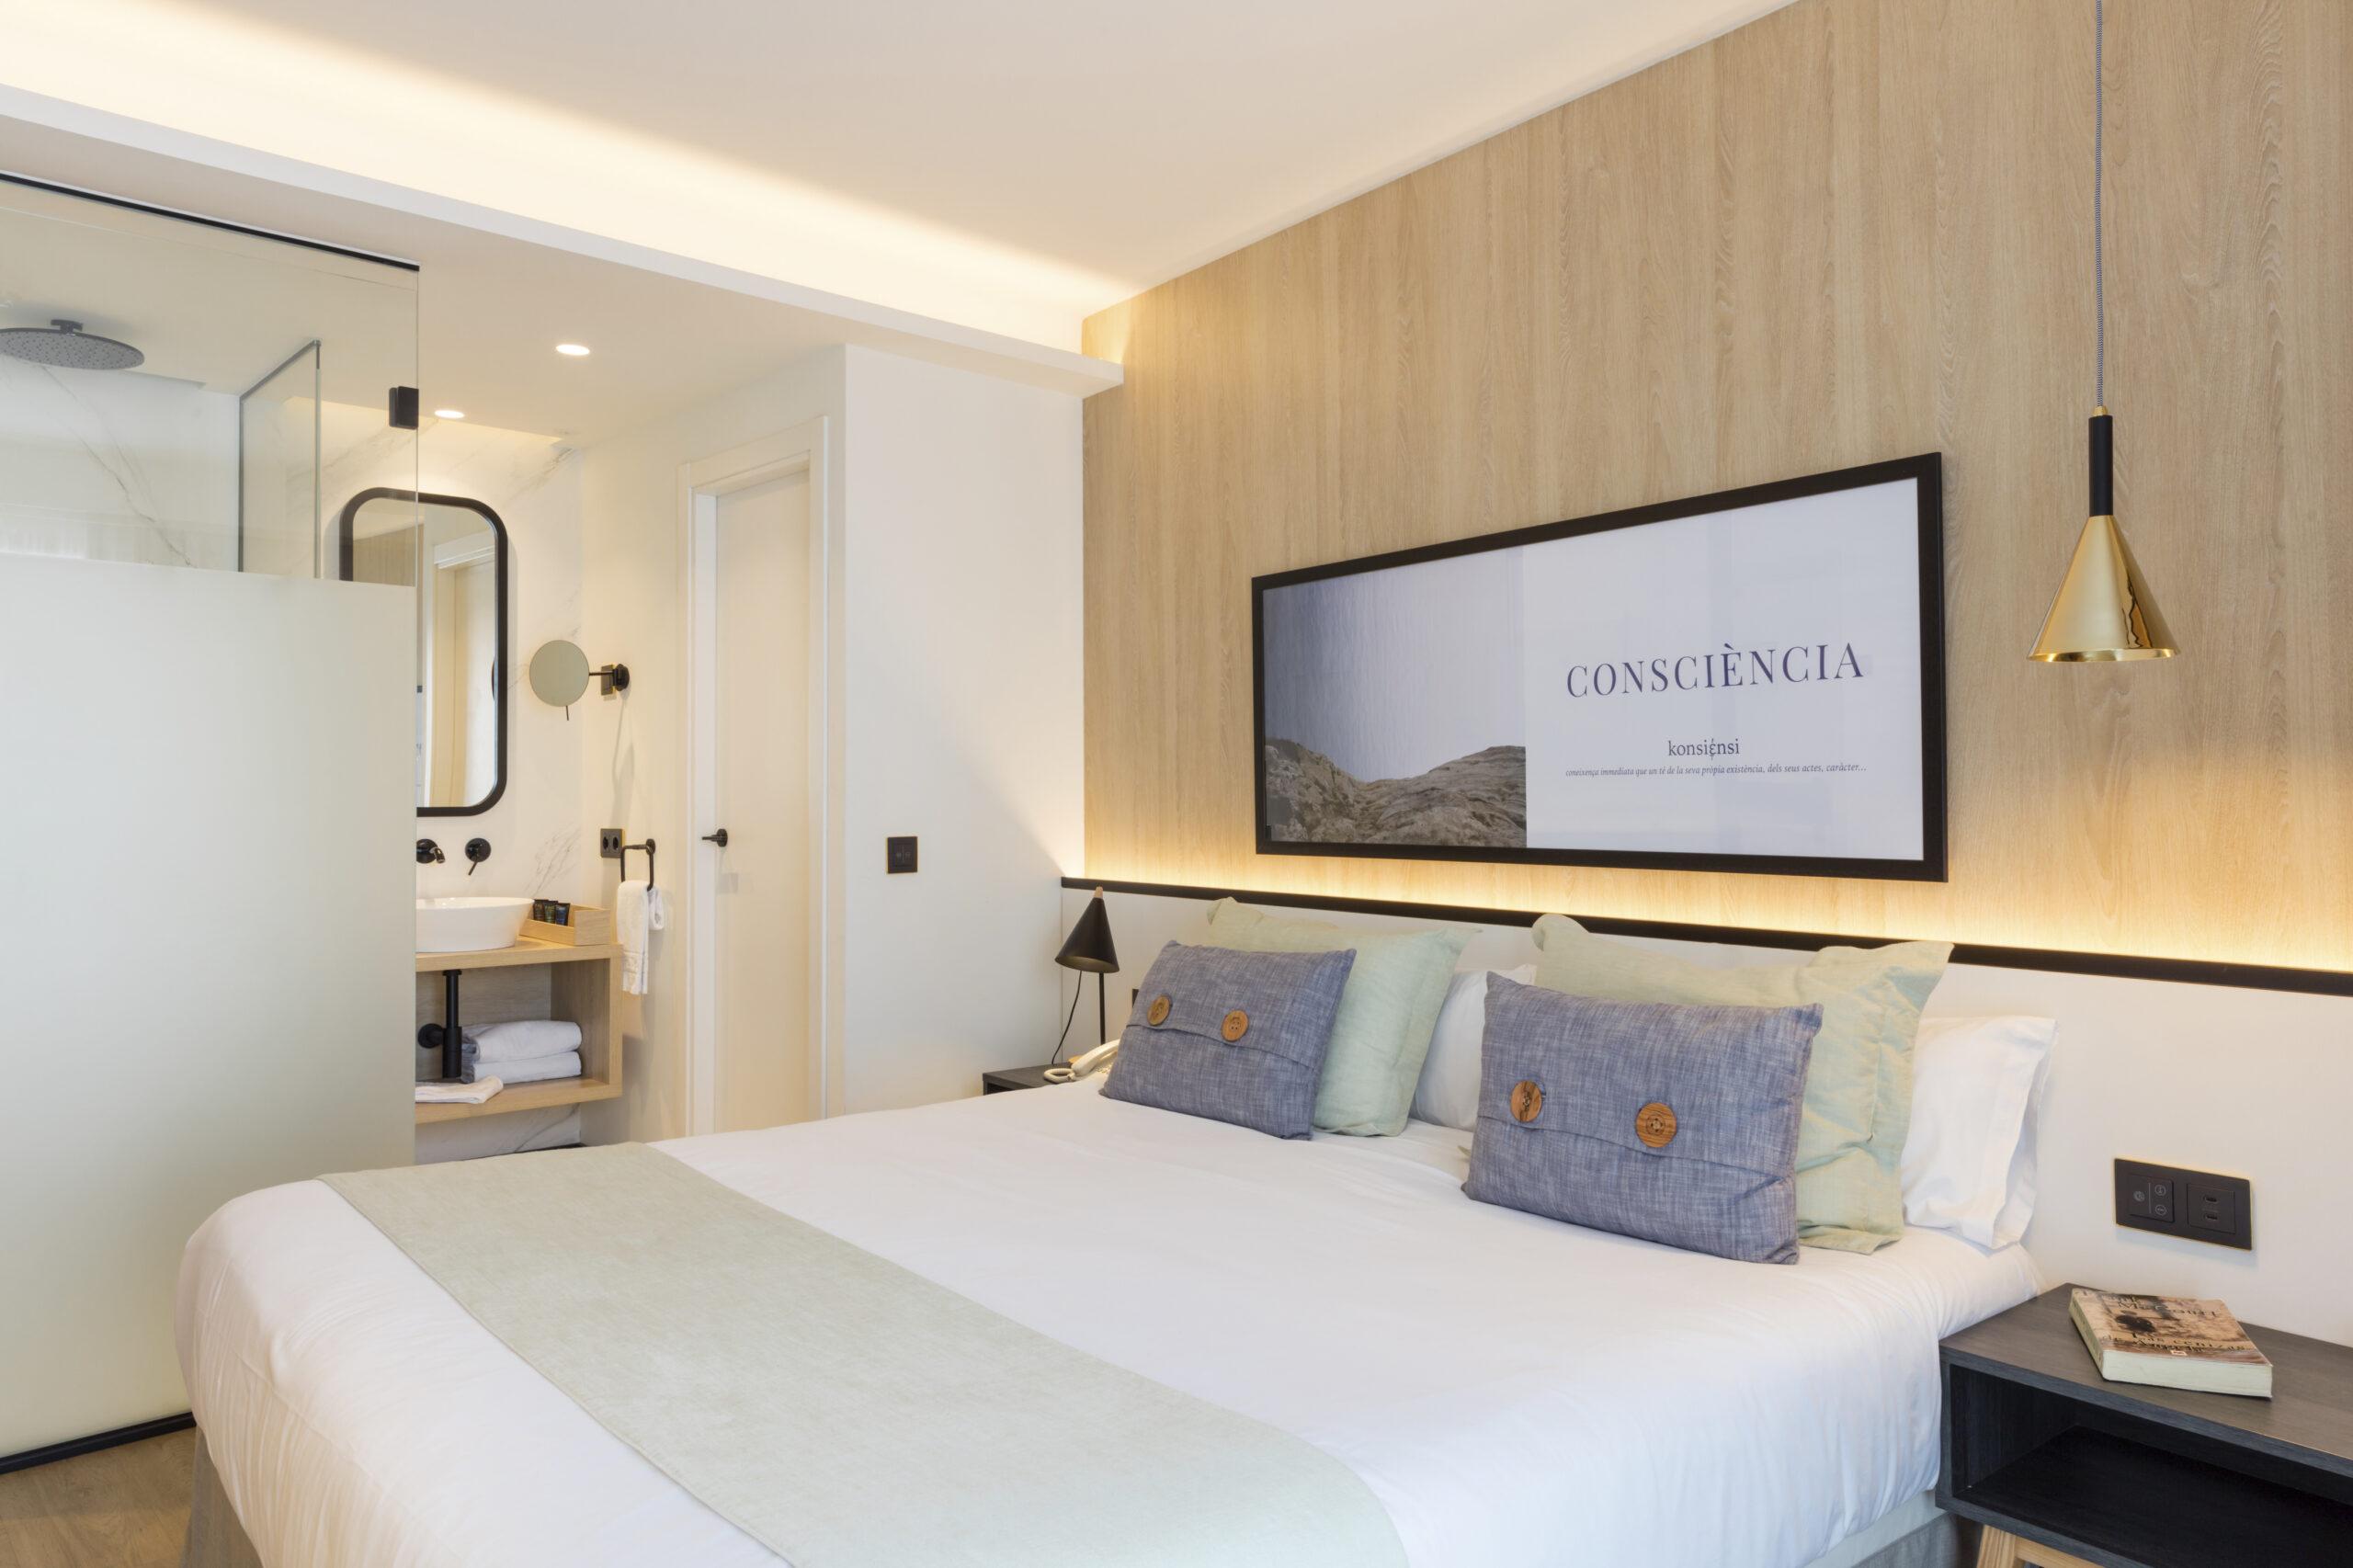 Ars Magna Bleisure Hotel - Habitación Doble Estándar - Cama de matrimonio